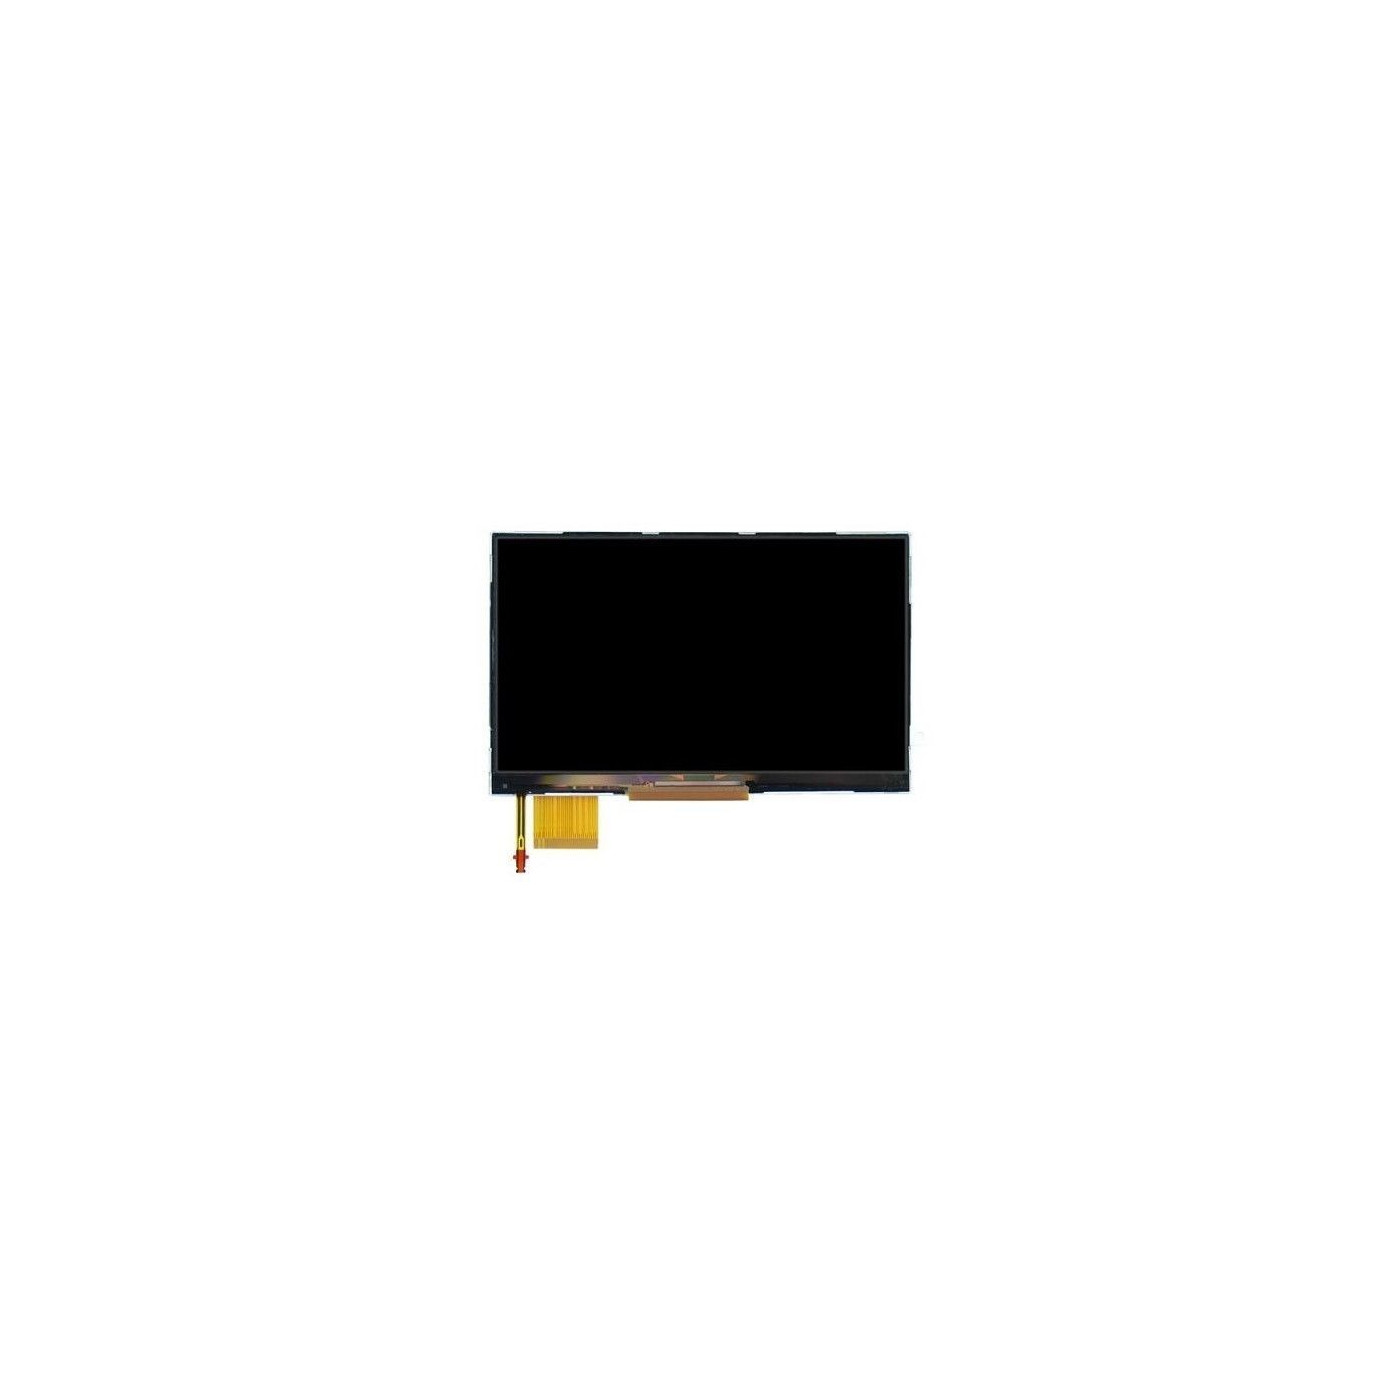 AFFICHAGE LCD LQODZC0031L POUR SONY PSP SLIM 3000 MONITEUR ECRAN